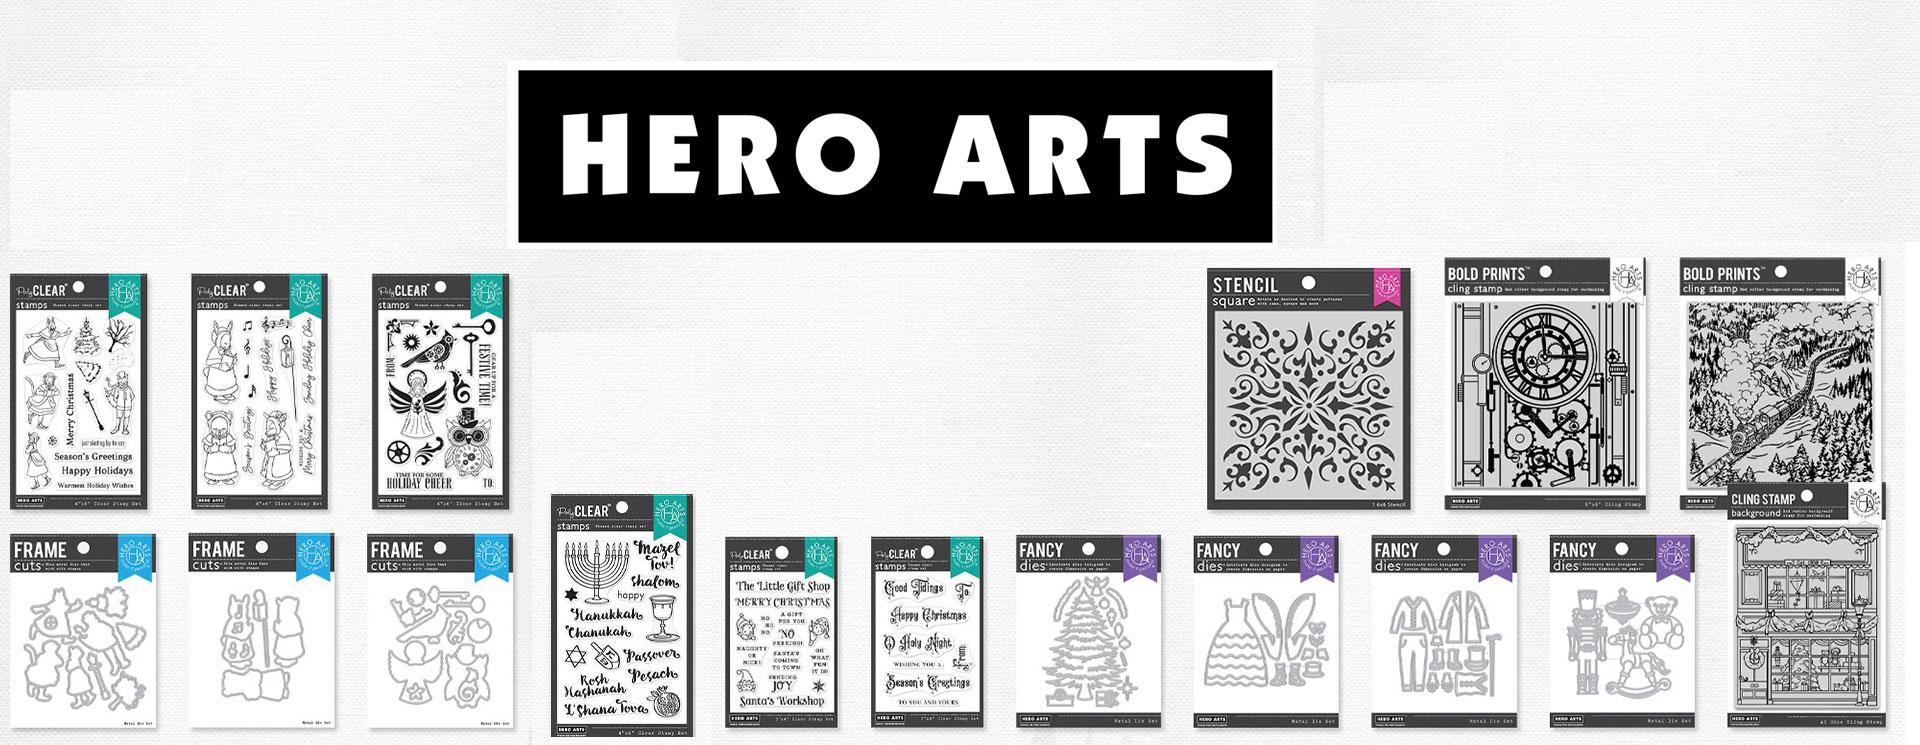 Hero Arts Stamp Images